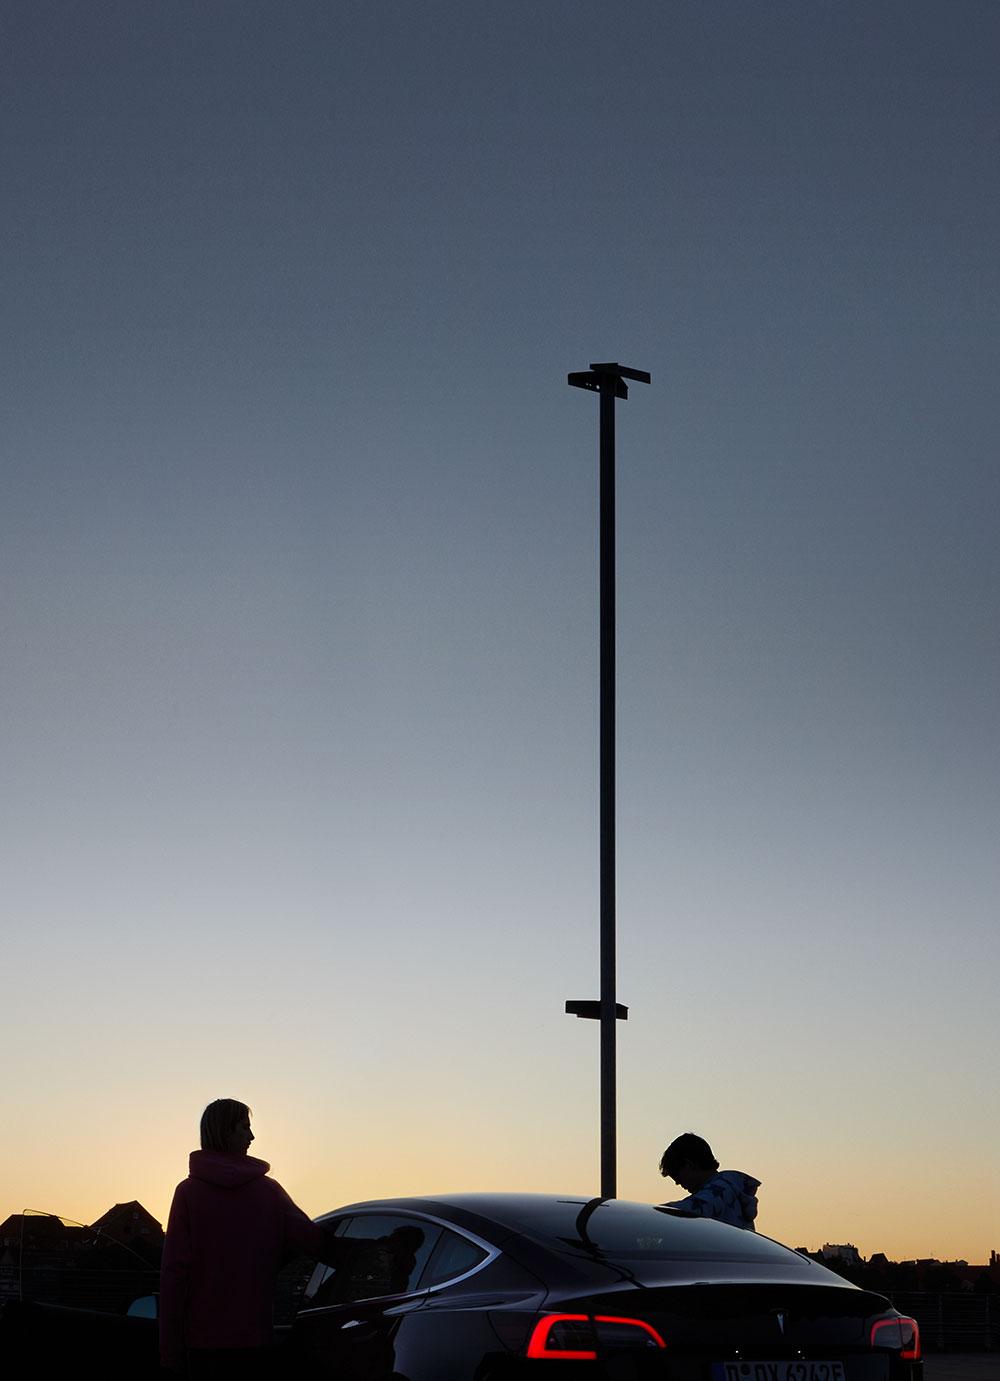 tesla_sunset_silhouettes